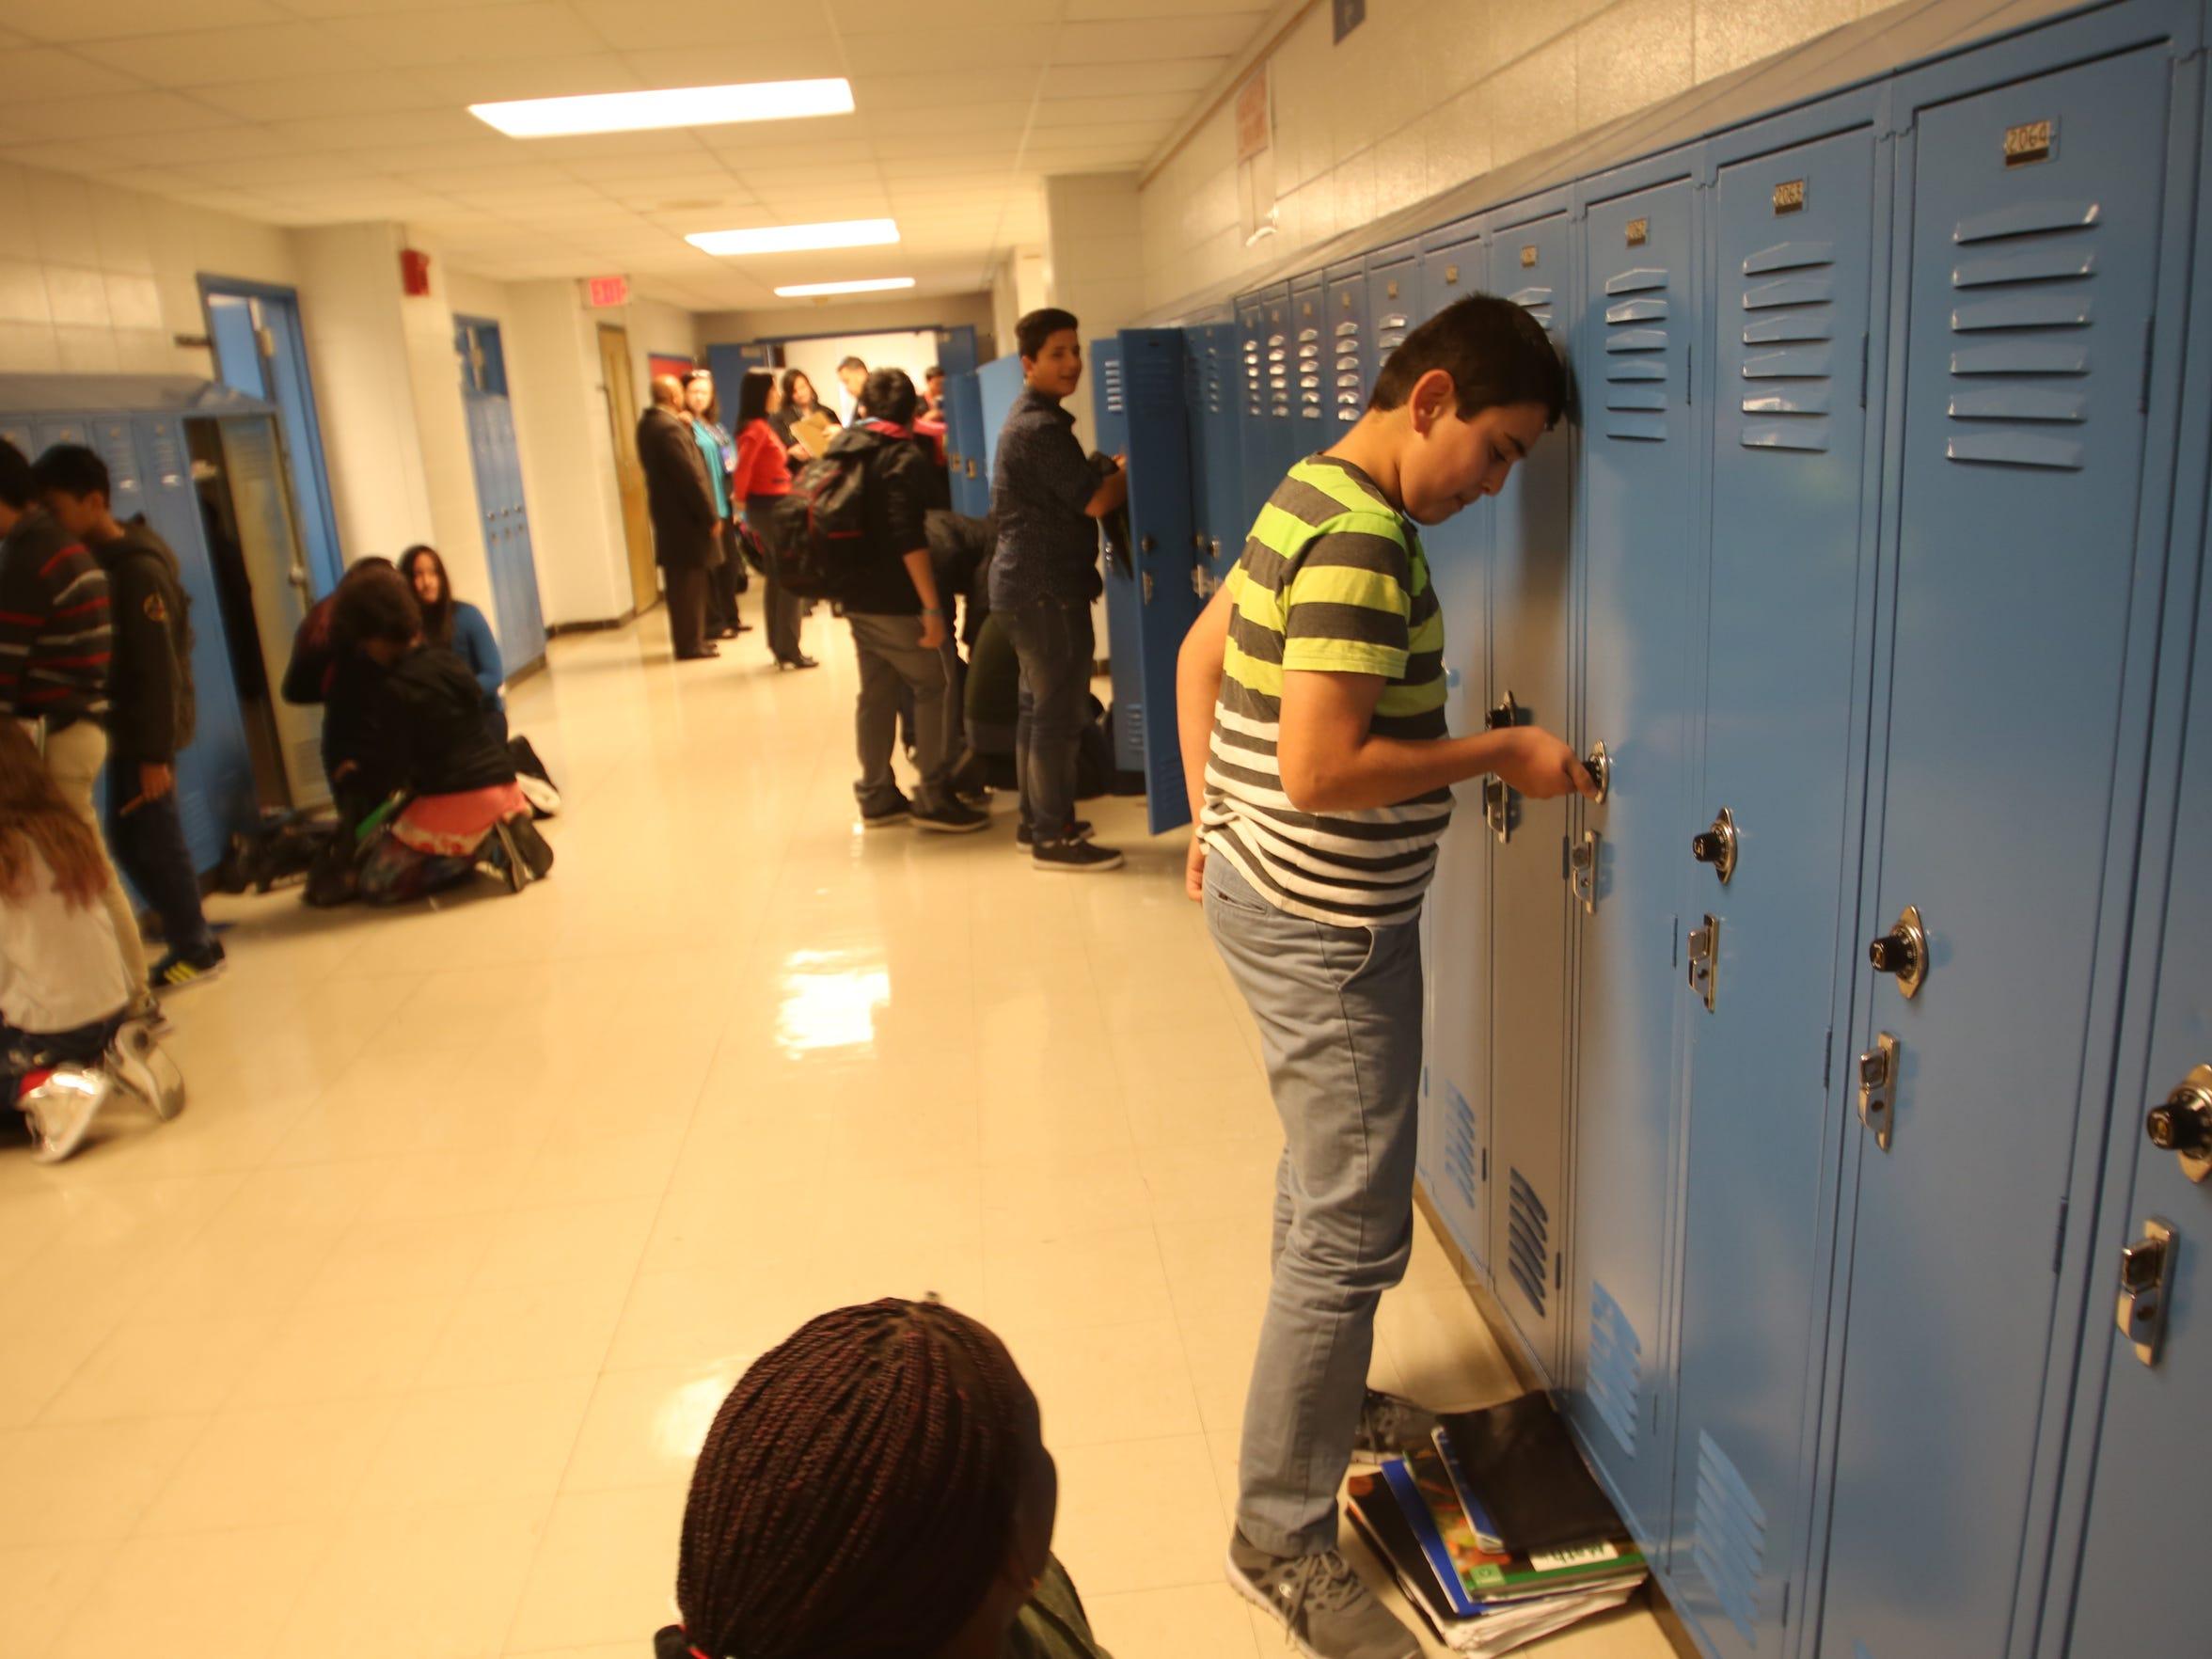 Abdulbaset Al-Tybawi attends Jefferson County Public Schools ESL Newcomer Academy.